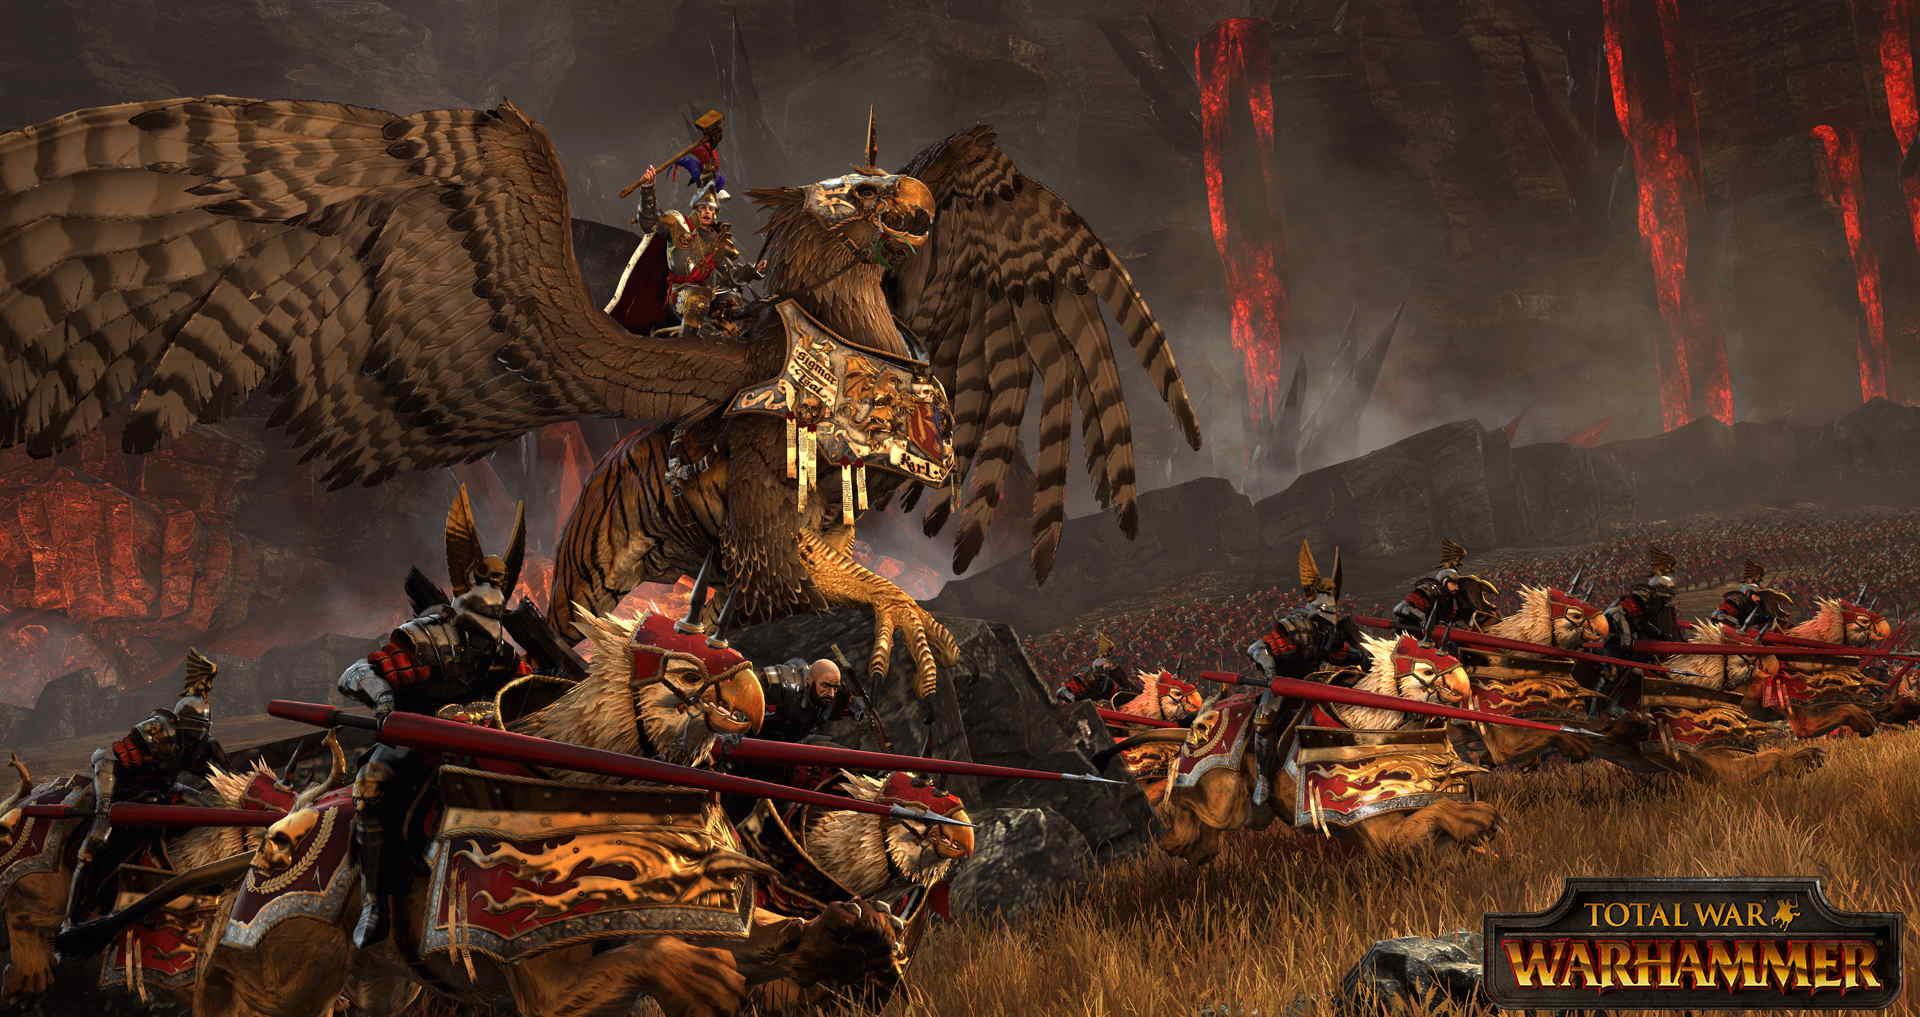 total war warhammer sistem gereksinimleri_3